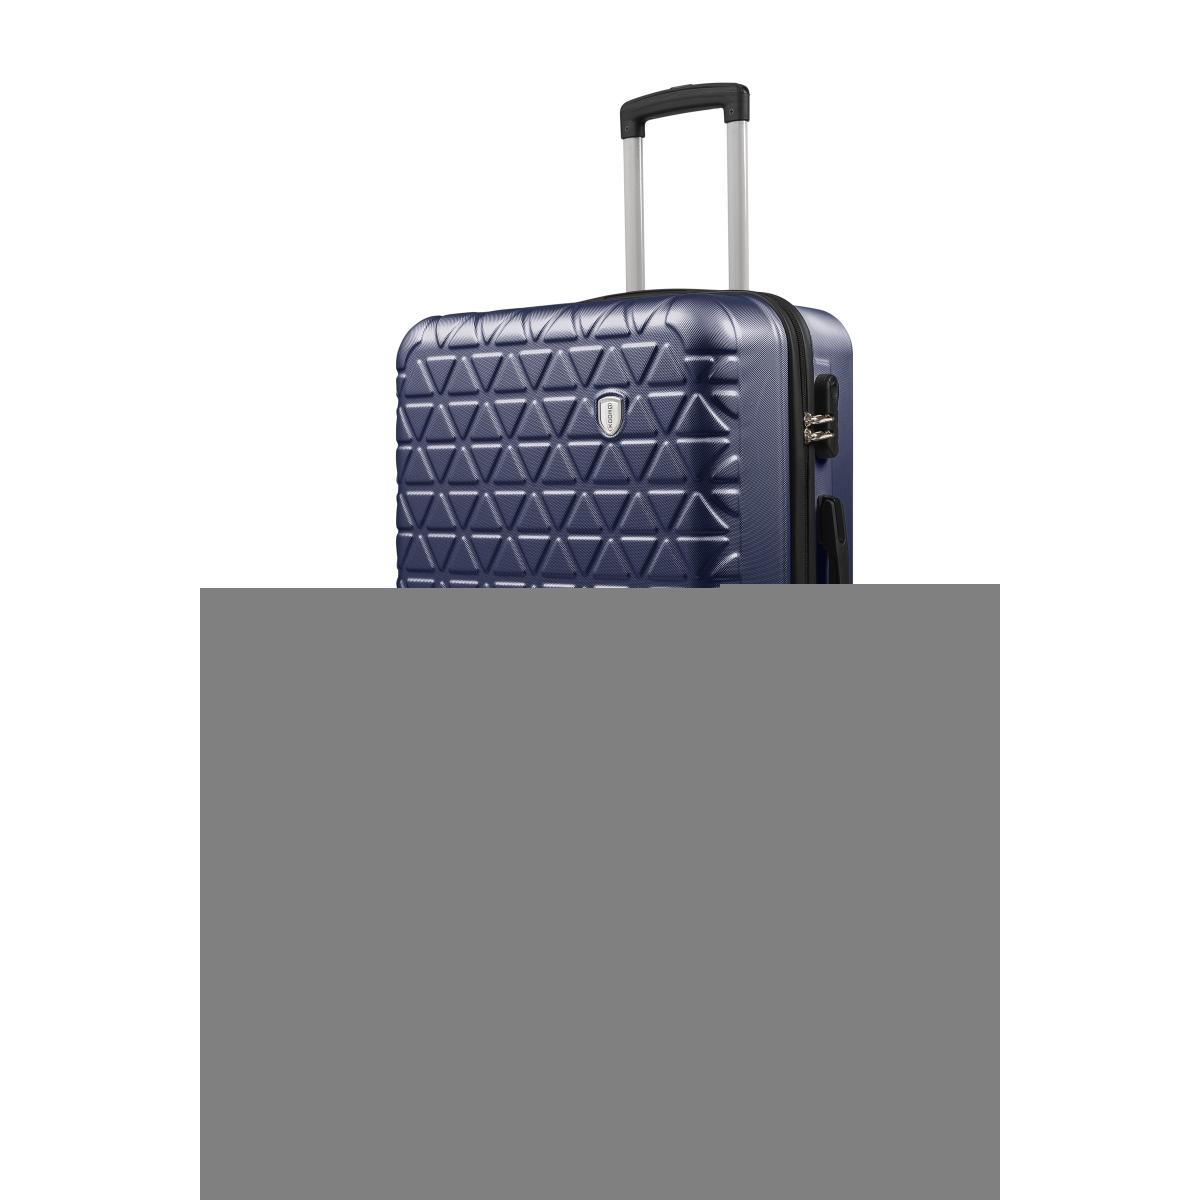 Gedox Abs 3'lü Valiz Seyahat Seti - Model:800.04 Lacivert